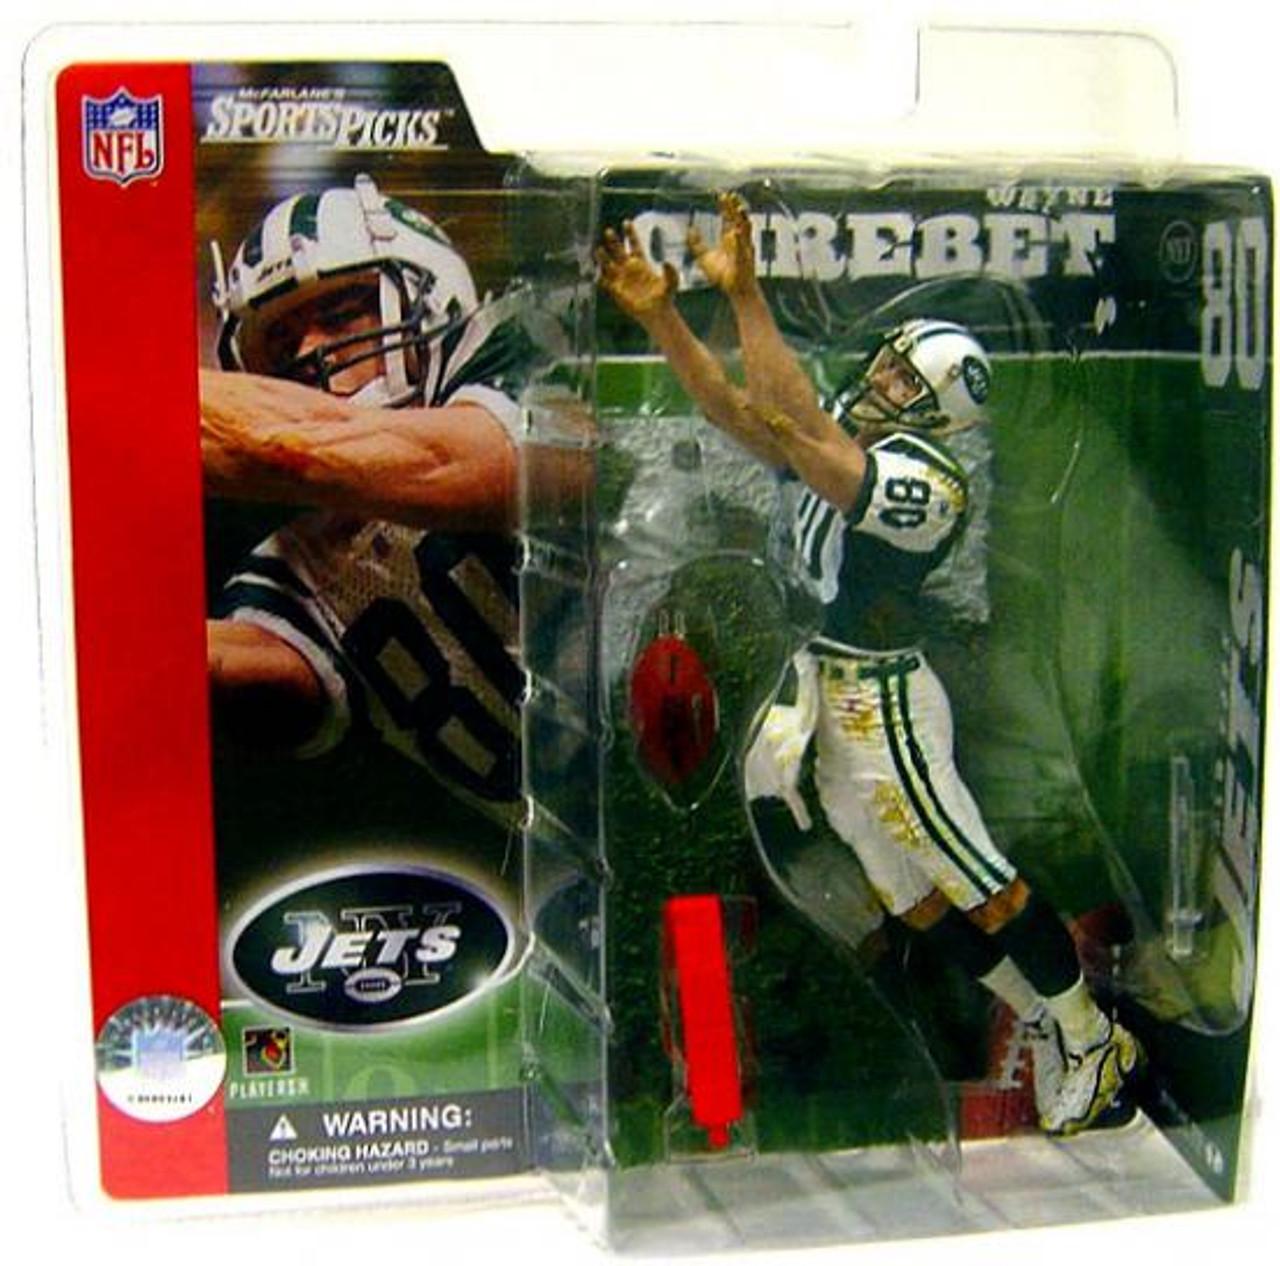 McFarlane Toys NFL New York Jets Sports Picks Series 2 Wayne Chrebet Action Figure [Green Jersey Variant]